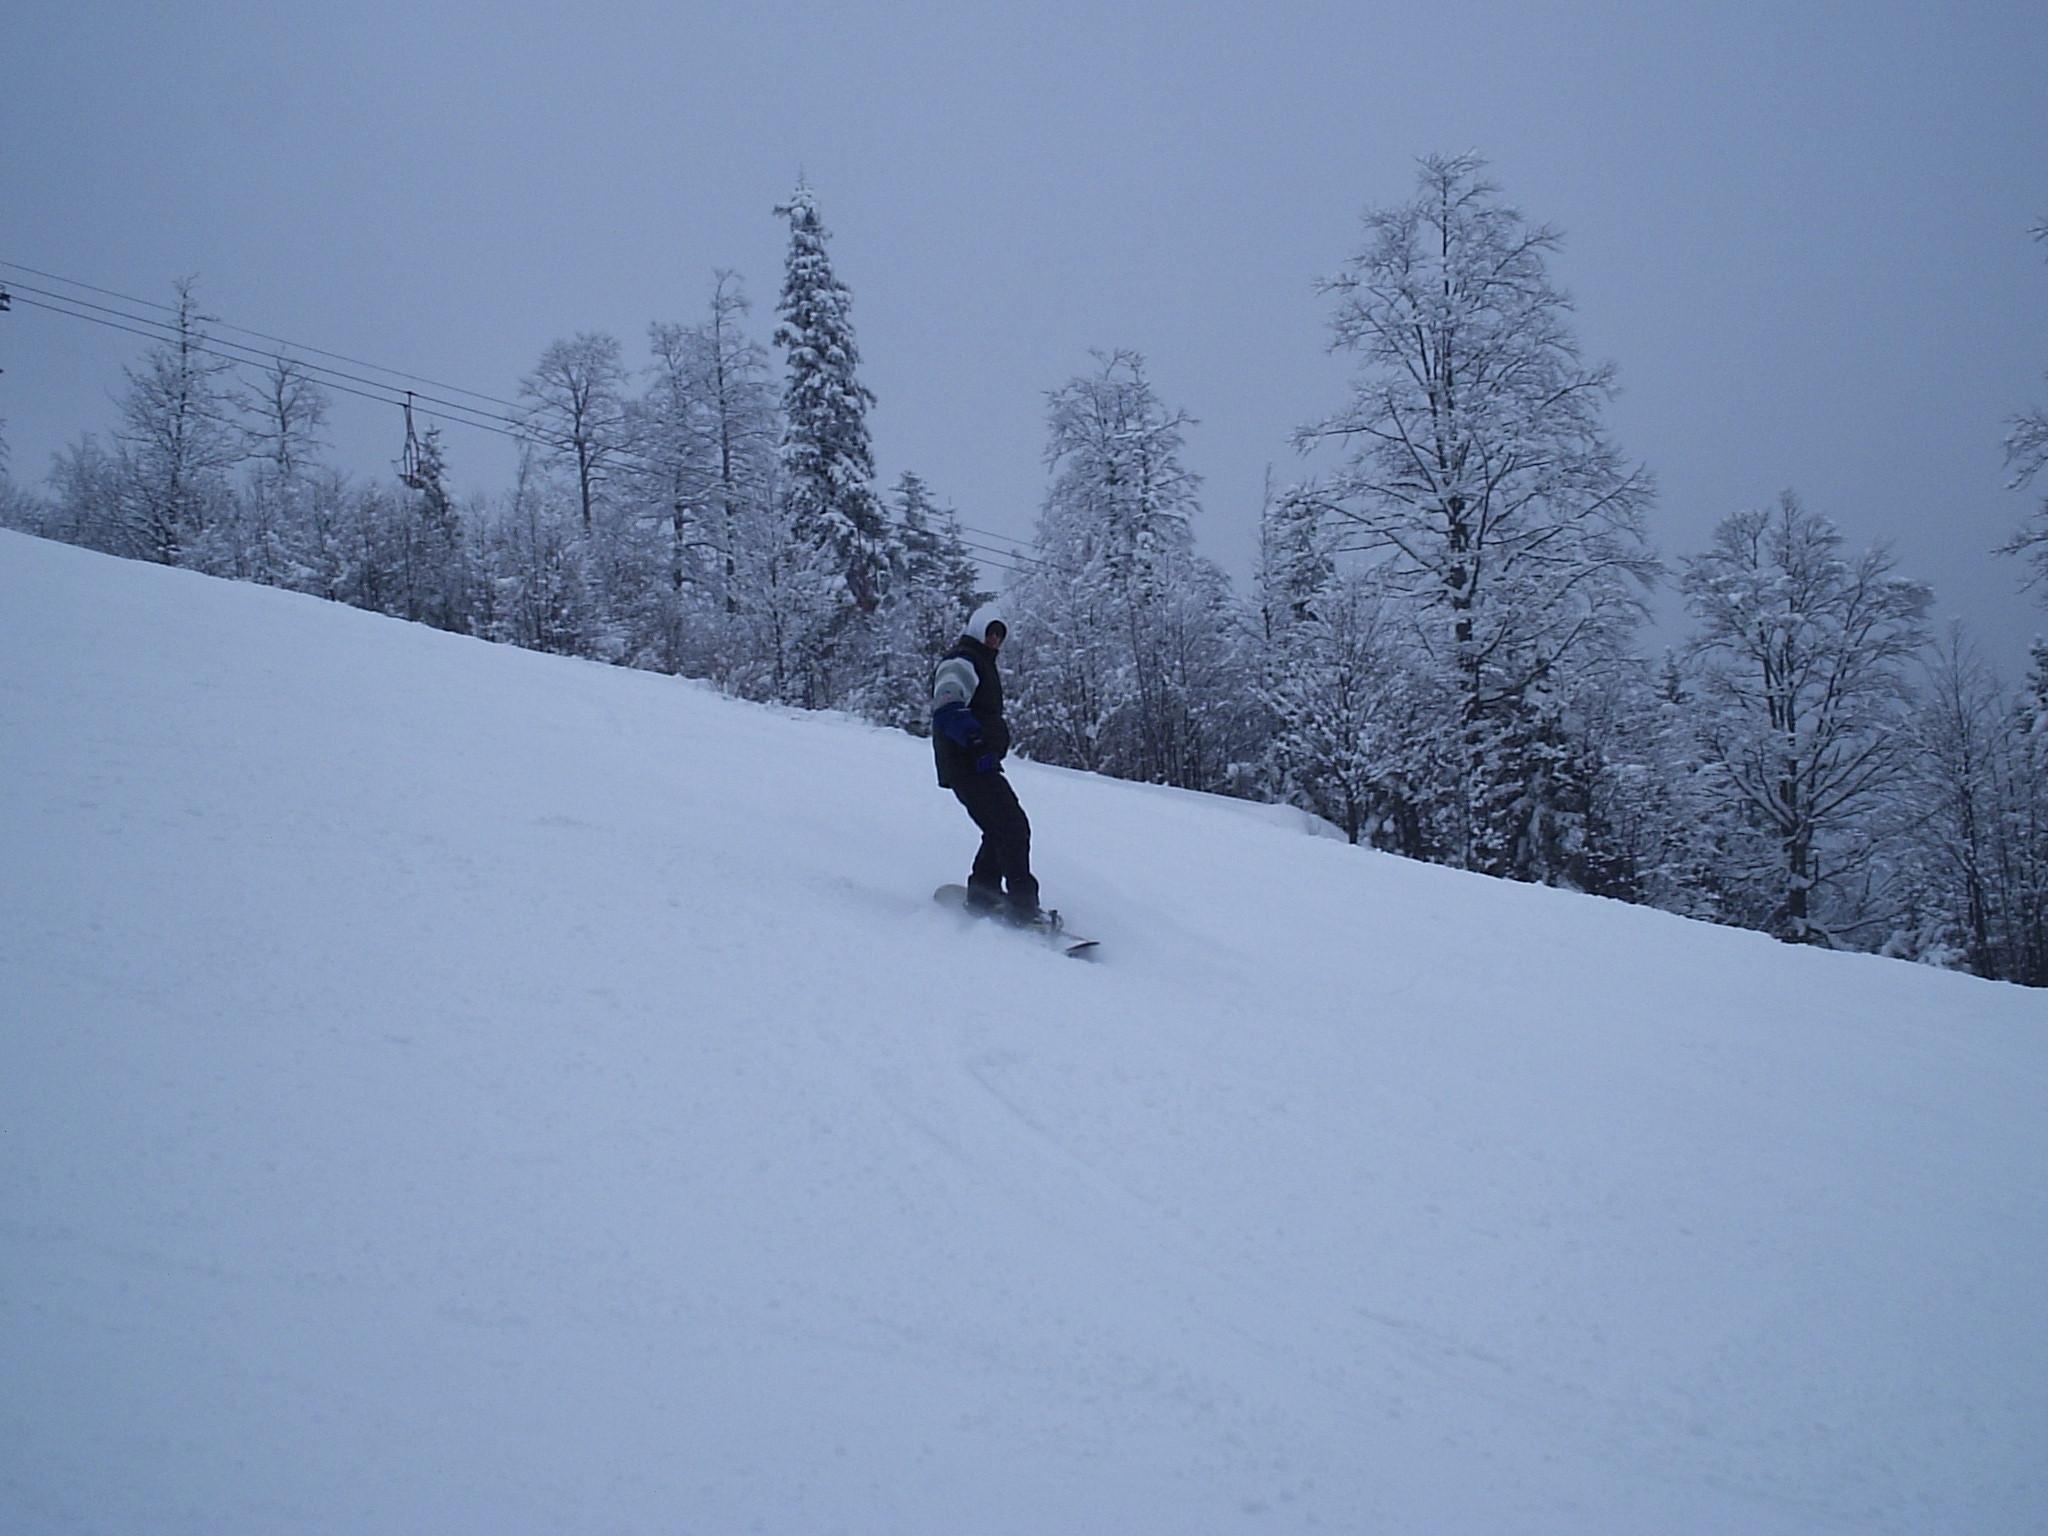 Riding Mt. Igman